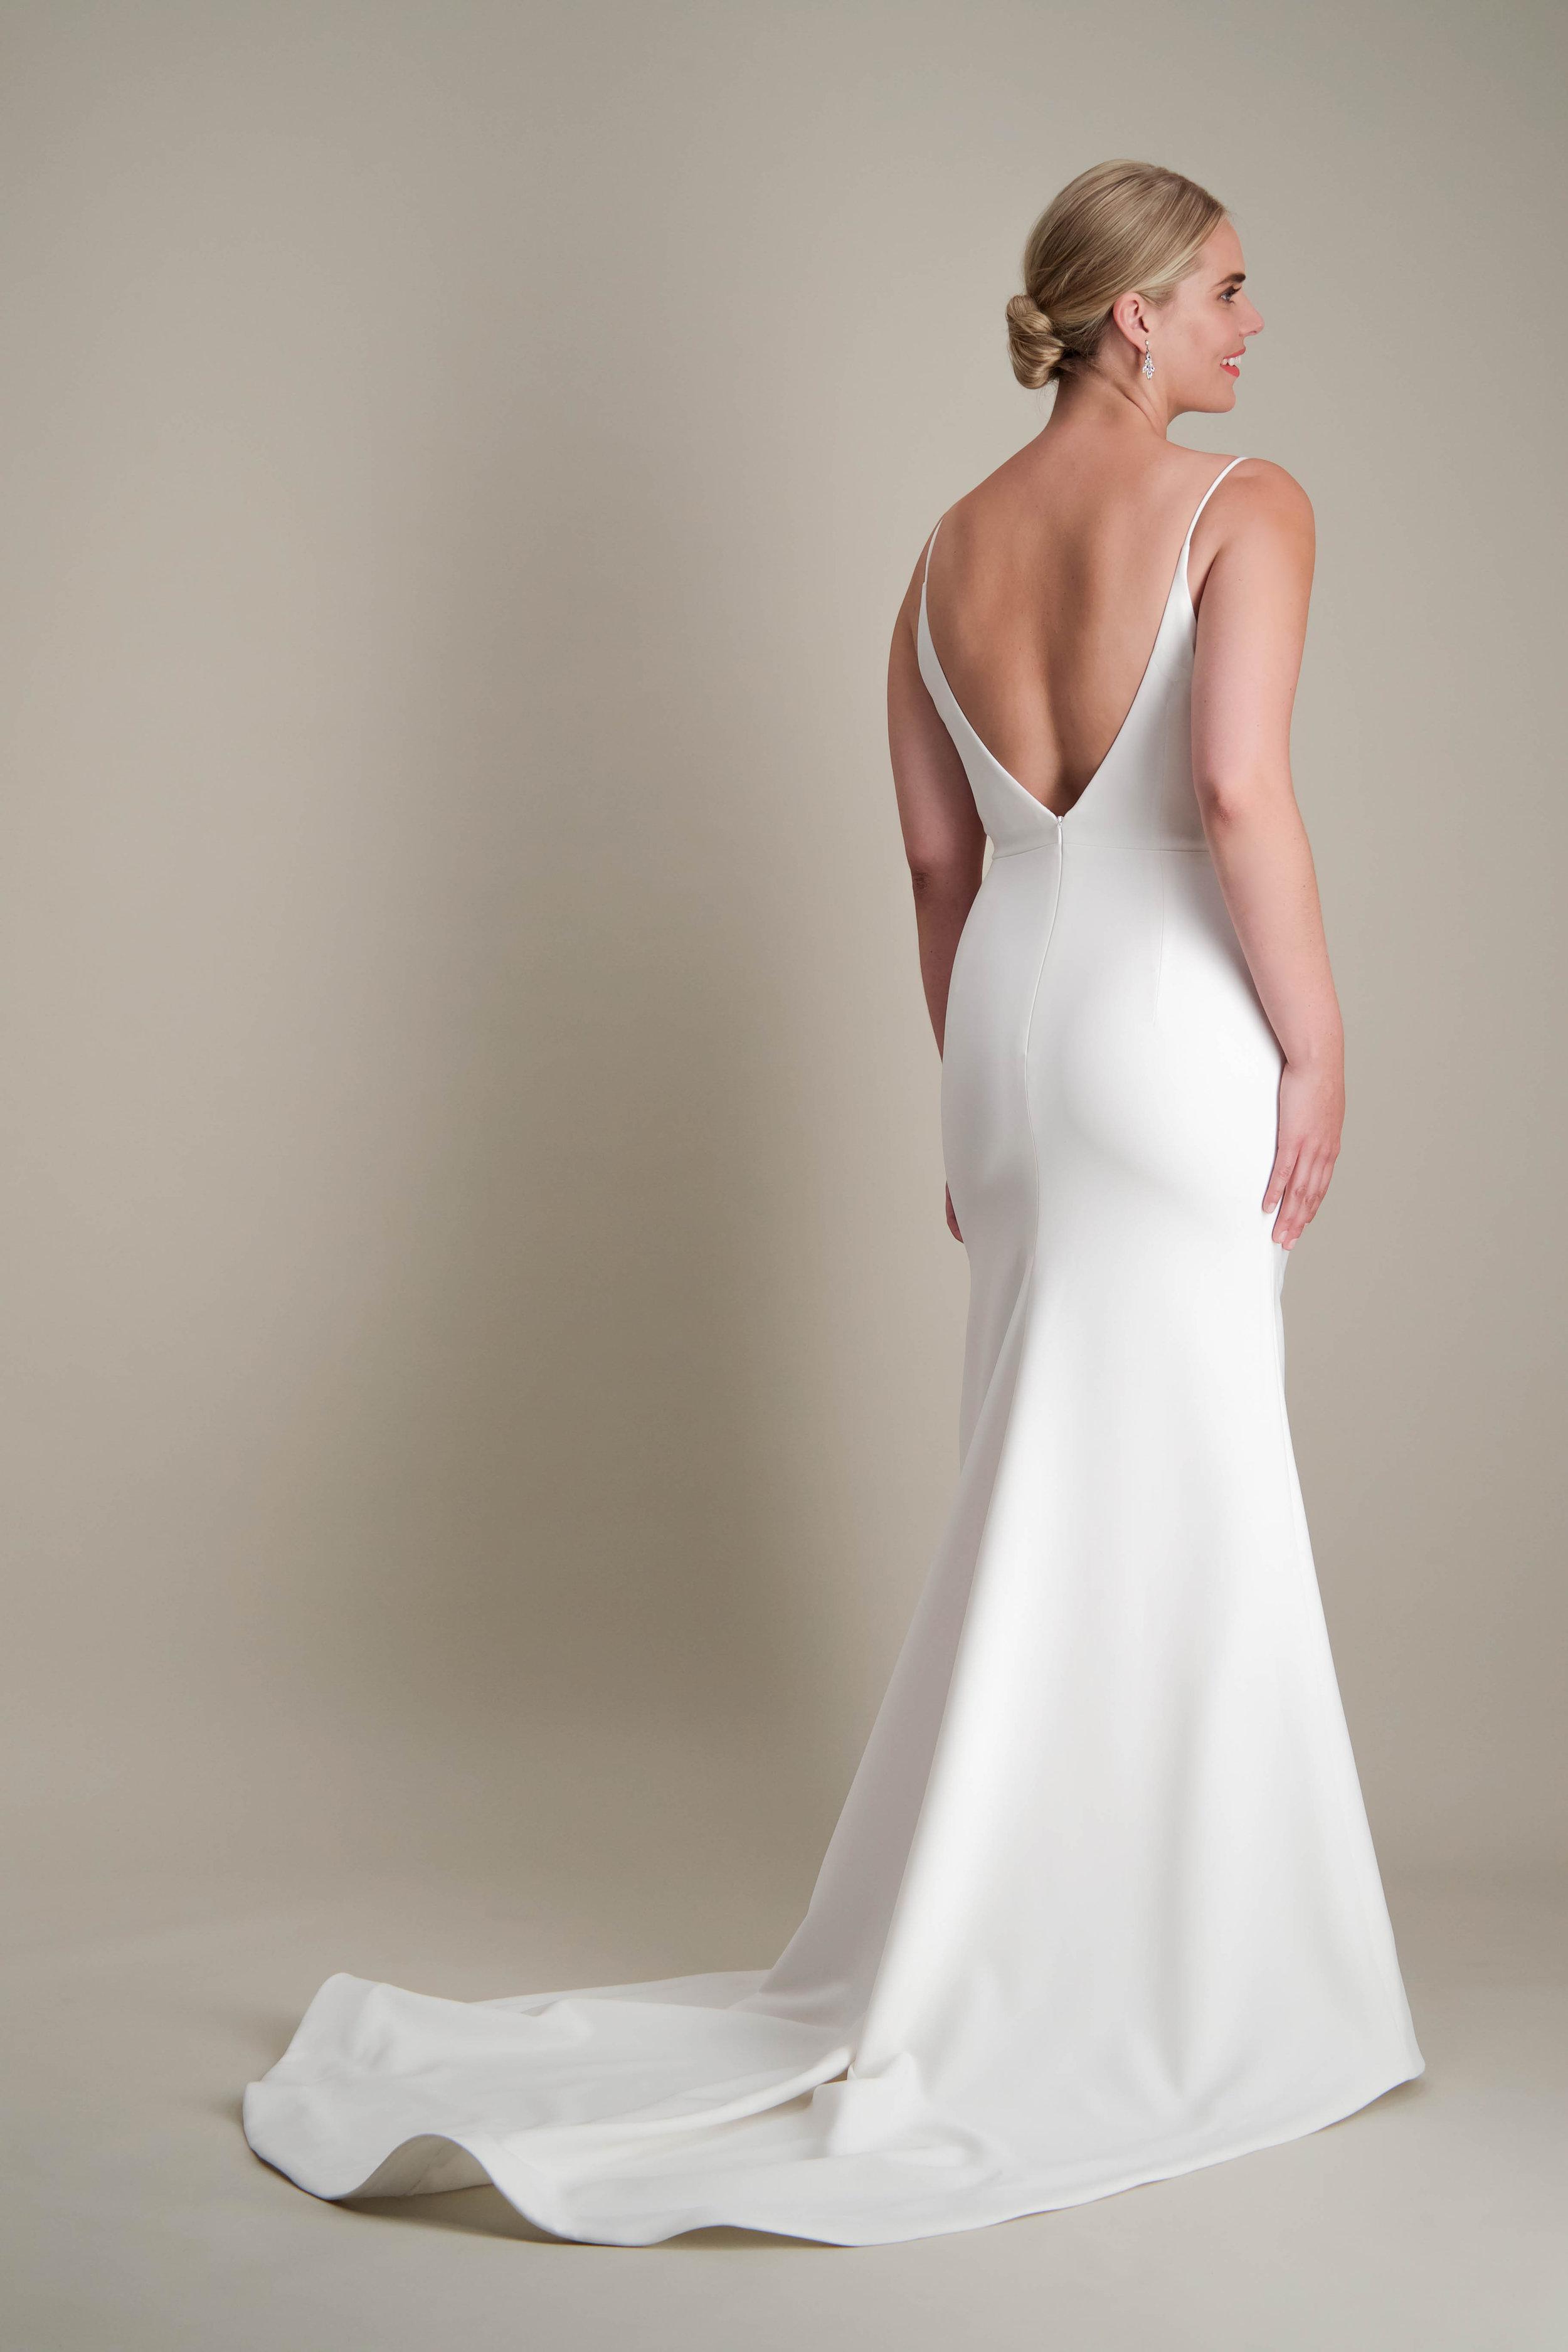 Islet gown fitted modern sleek wedding dress 5.jpg